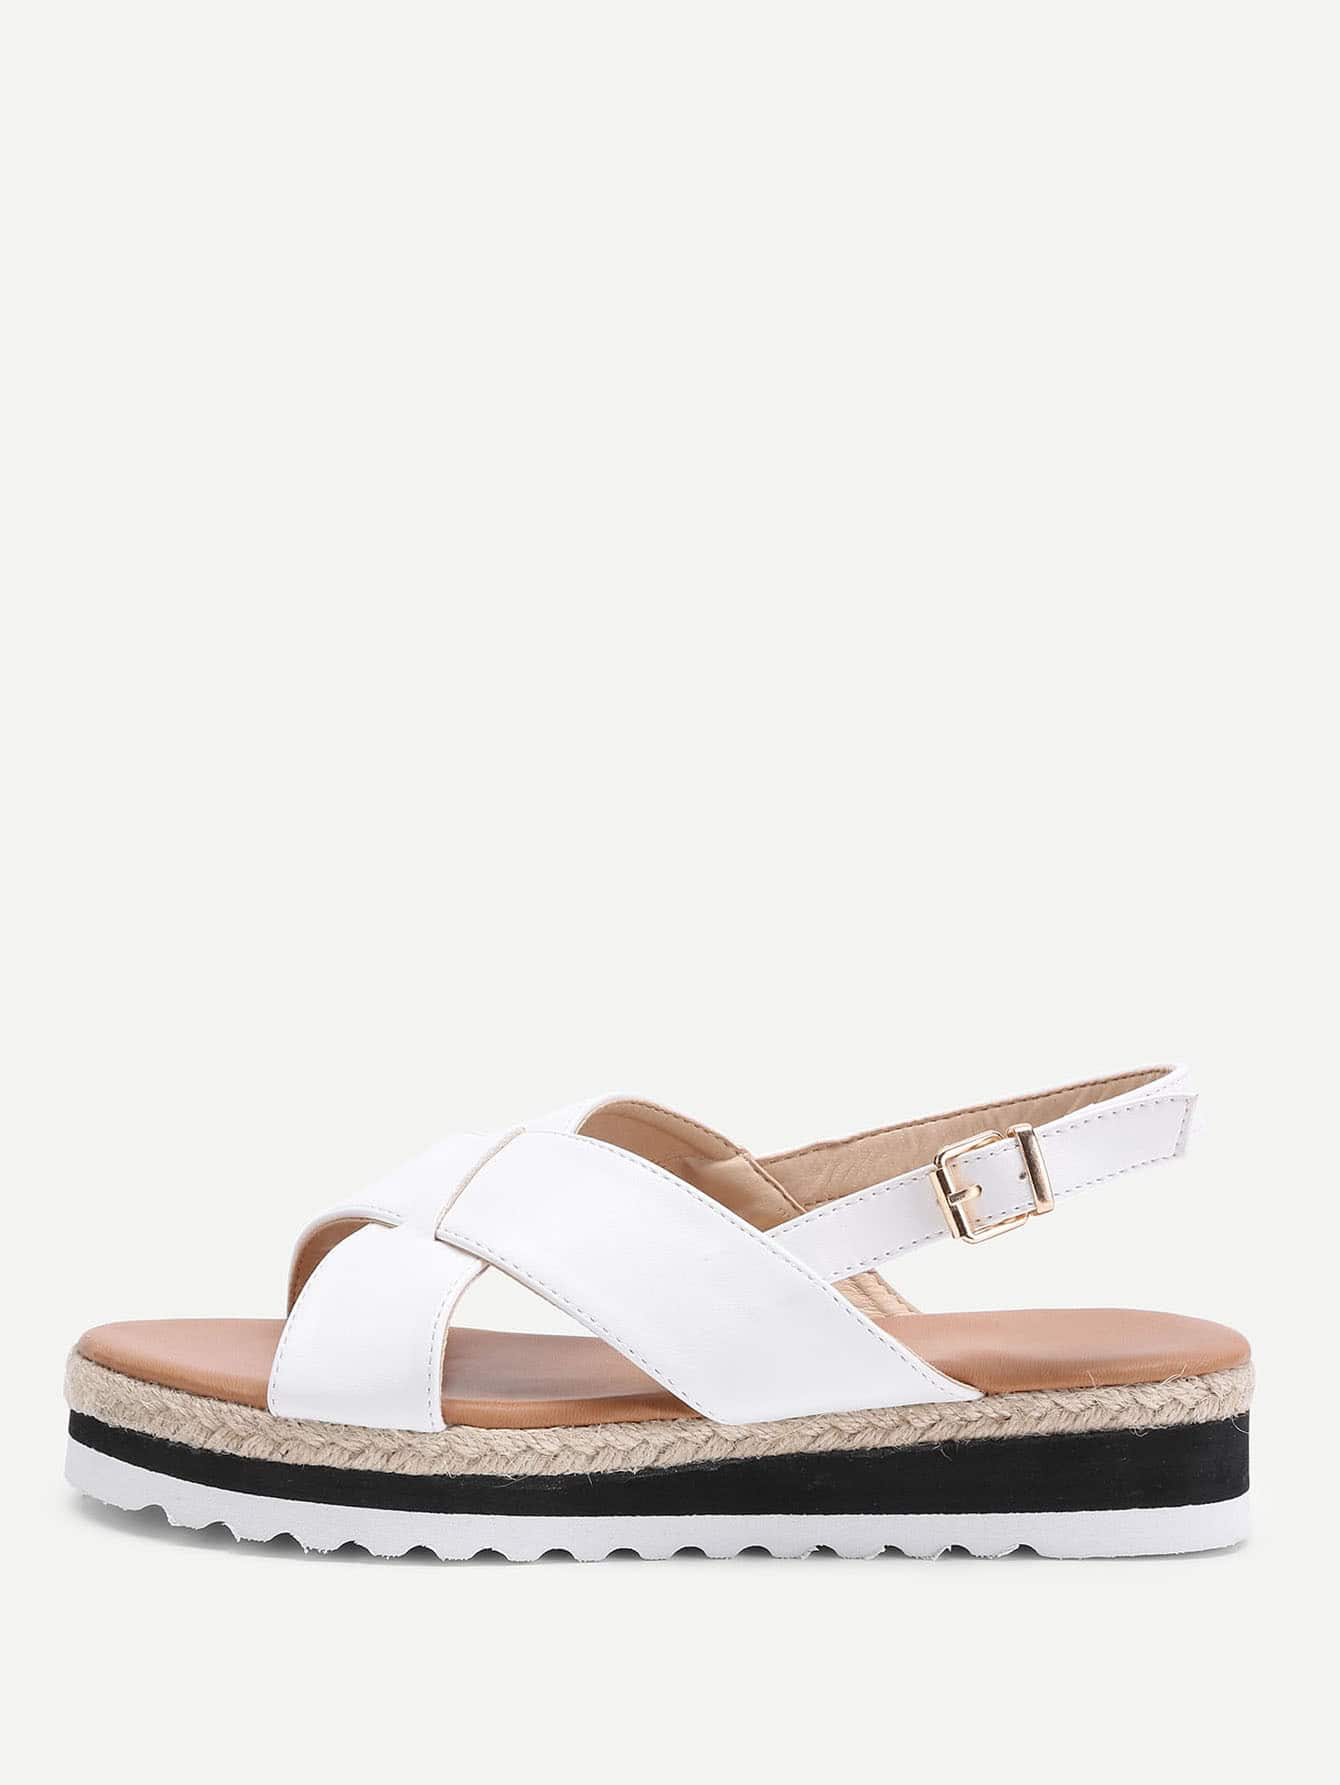 Image of Criss Cross Flatform PU Sandals